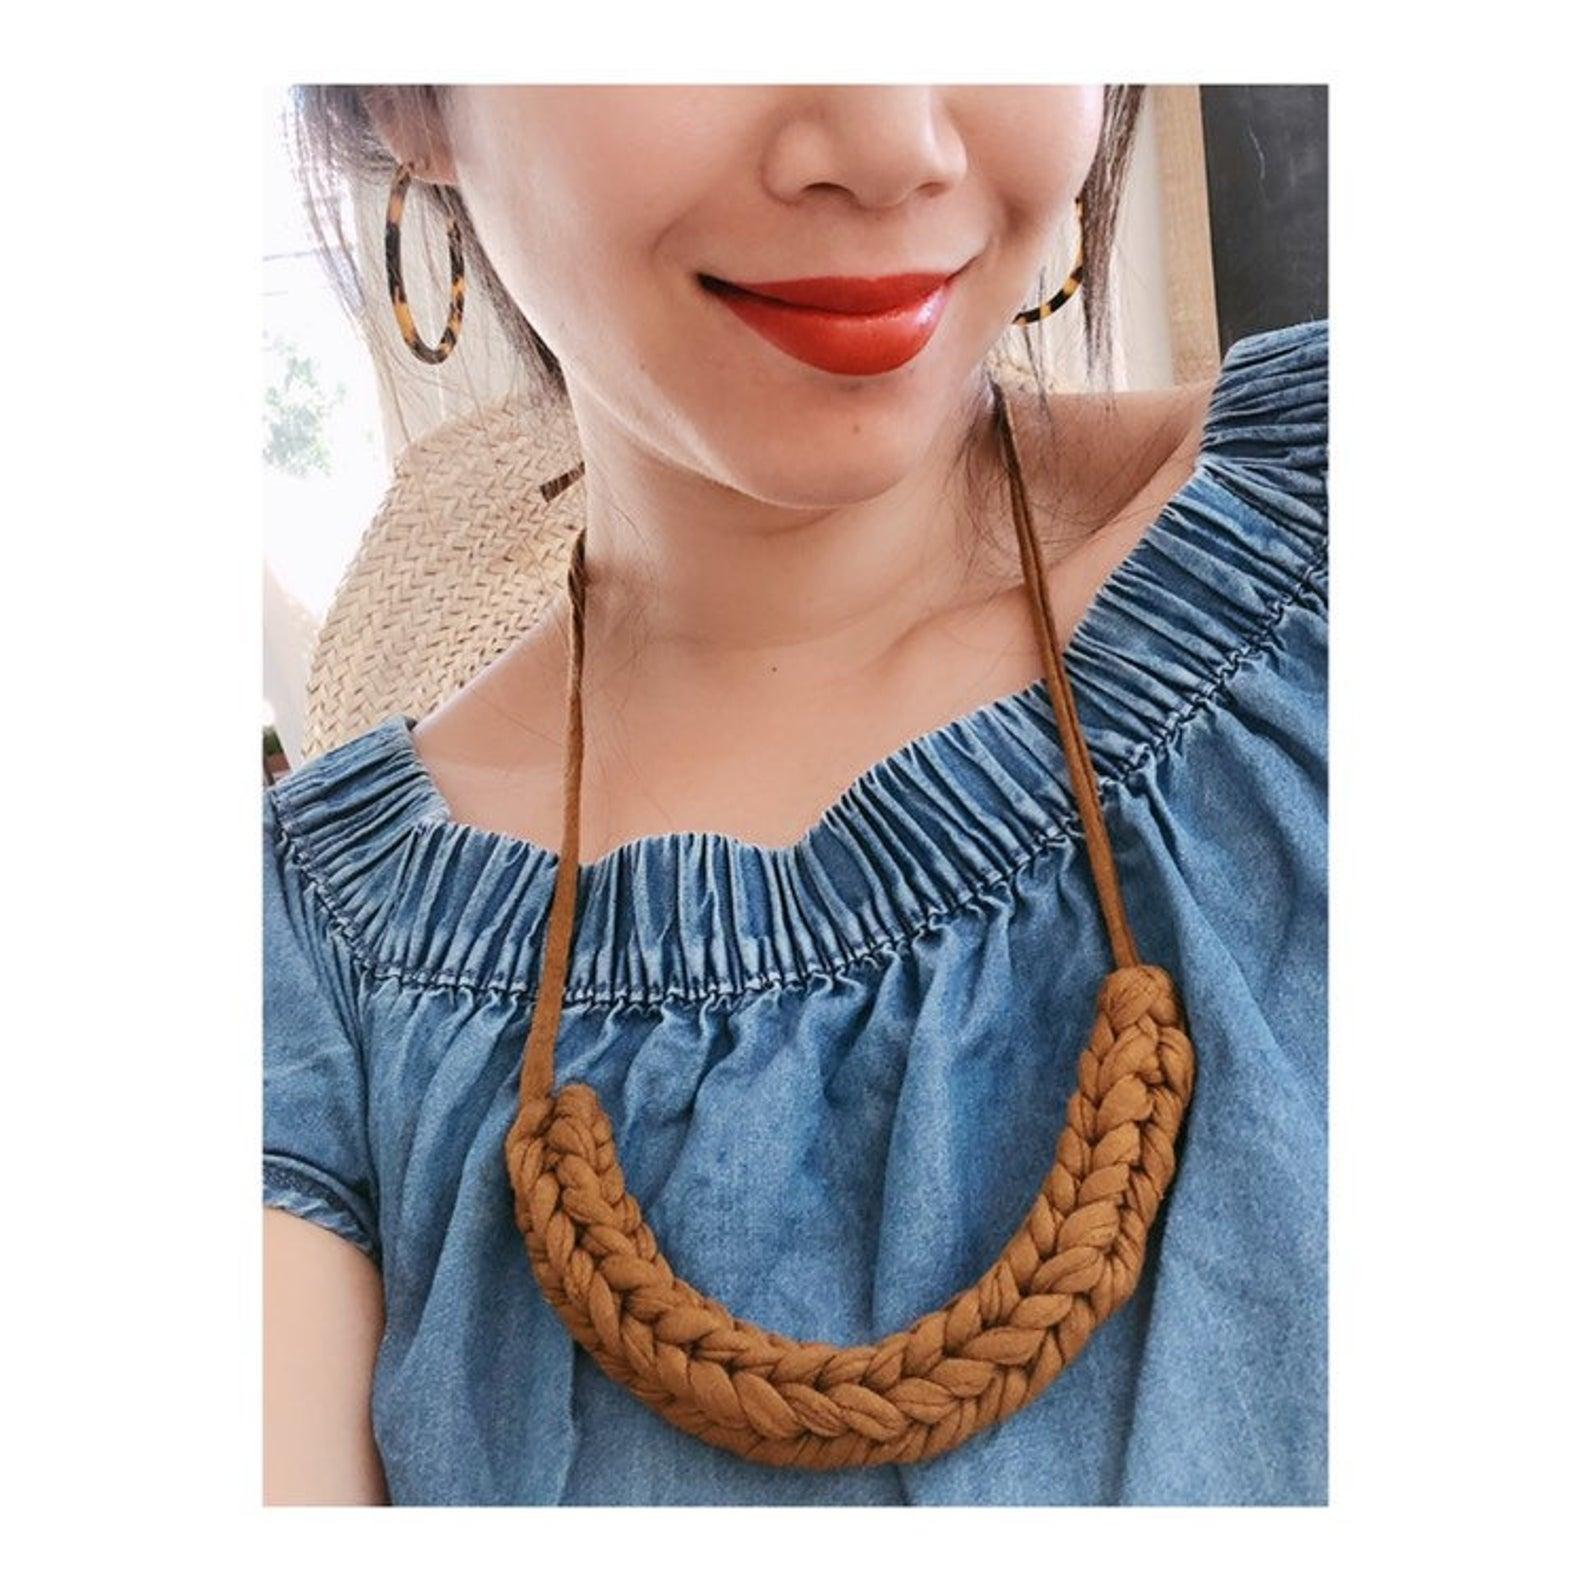 handmade-cotton-necklace-pattern-knitting-crochet-support-local-magazine-mustard-brown-neckalce.jpg